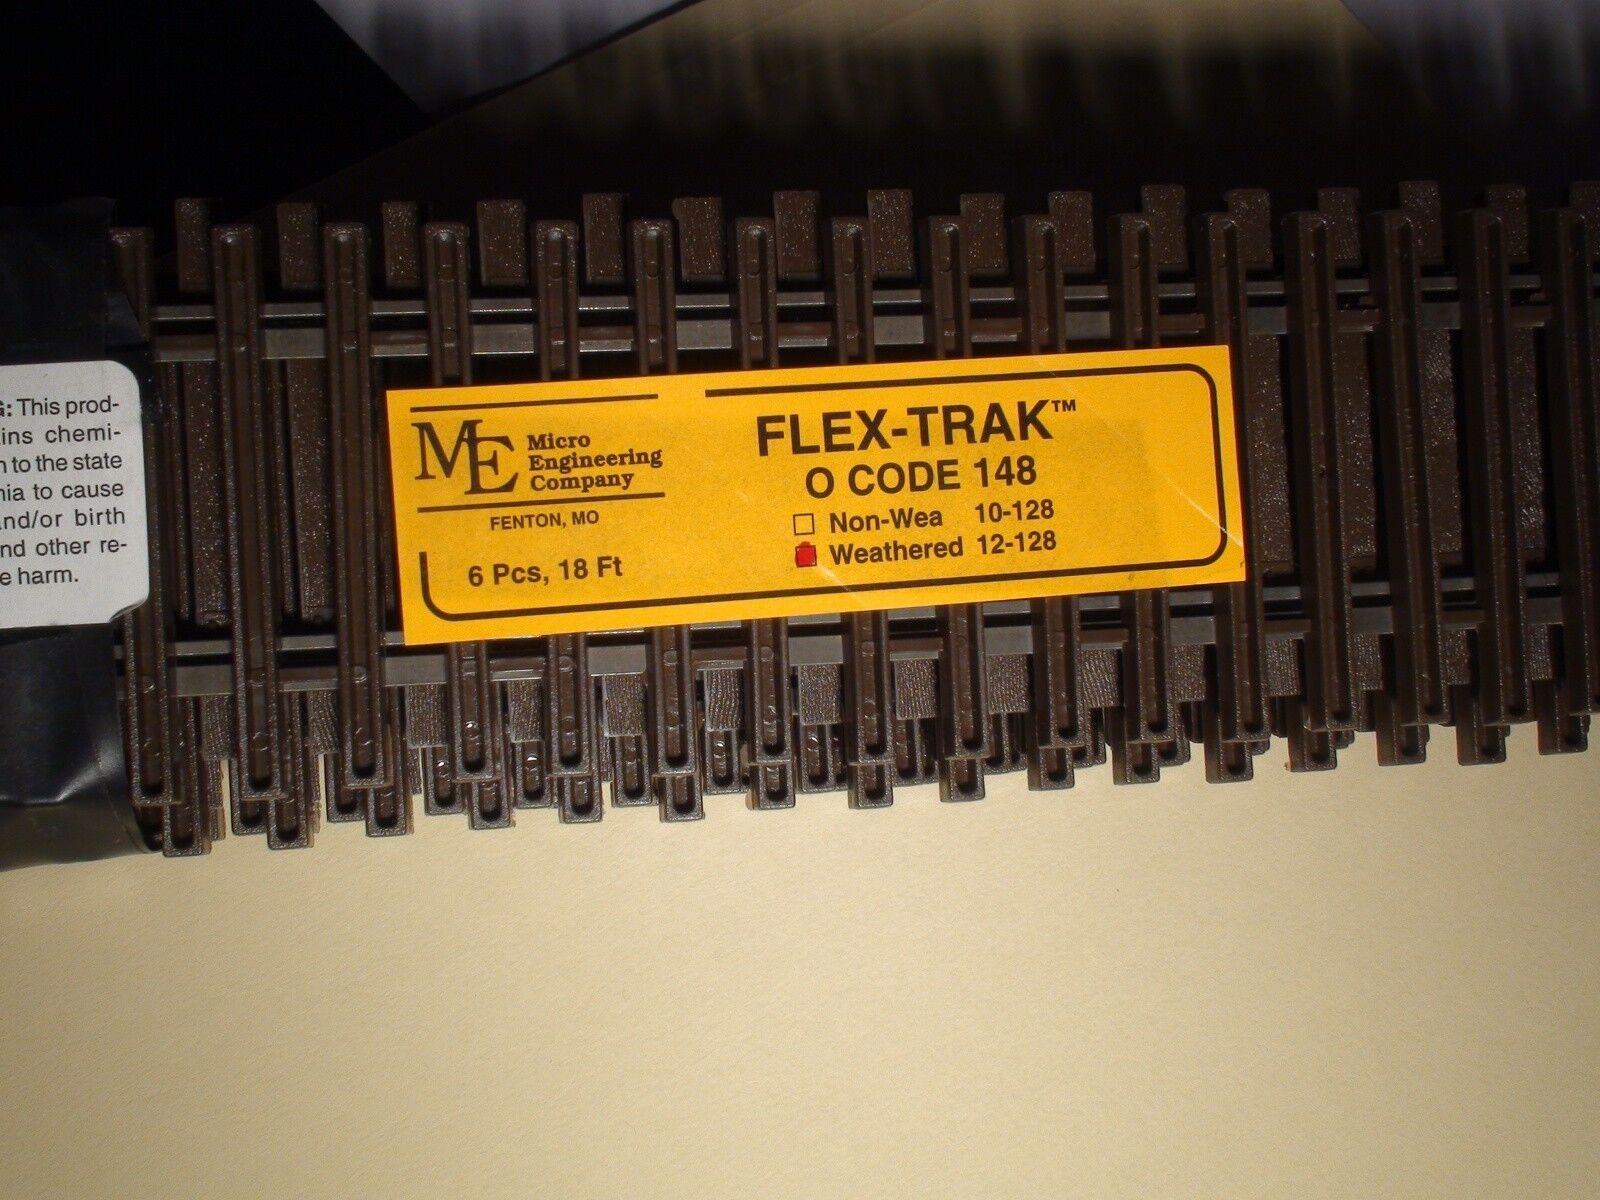 Escala O-Micro-ingeniería Flex-track código 148 degradado